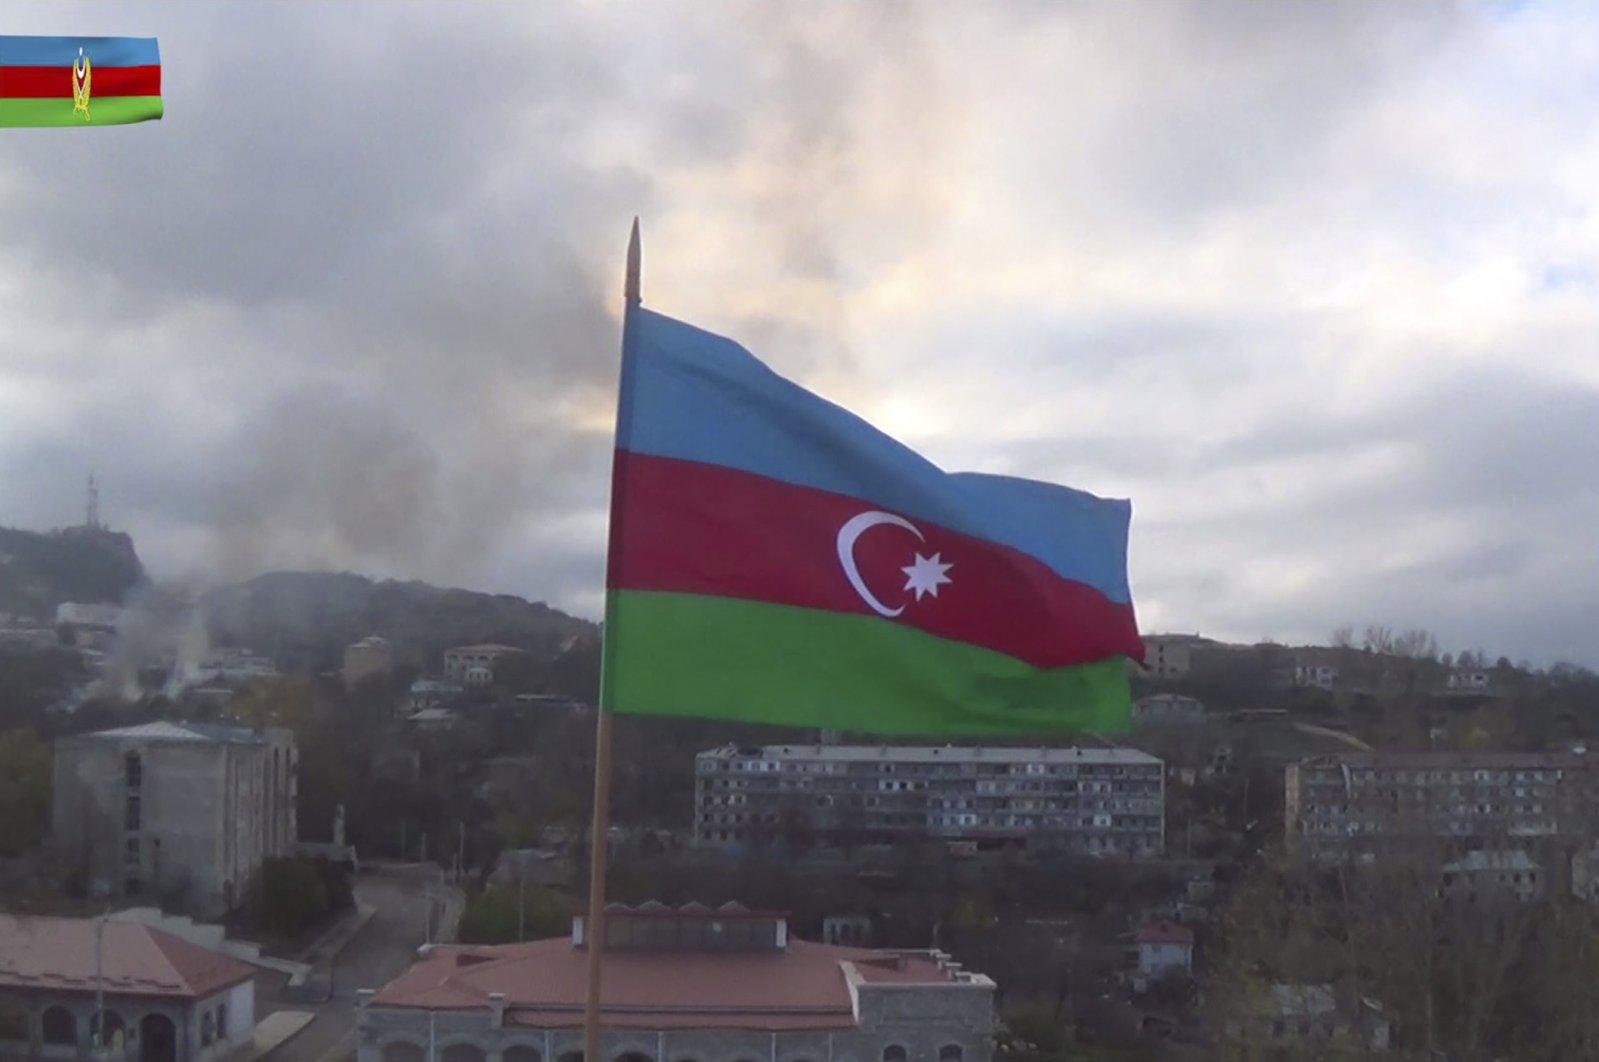 An Azerbaijani flag flies in the wind atop a building in the town of Shusha in the region of Nagorno-Karabakh, Azerbaijan, Nov. 9, 2020. (AFP Photo)